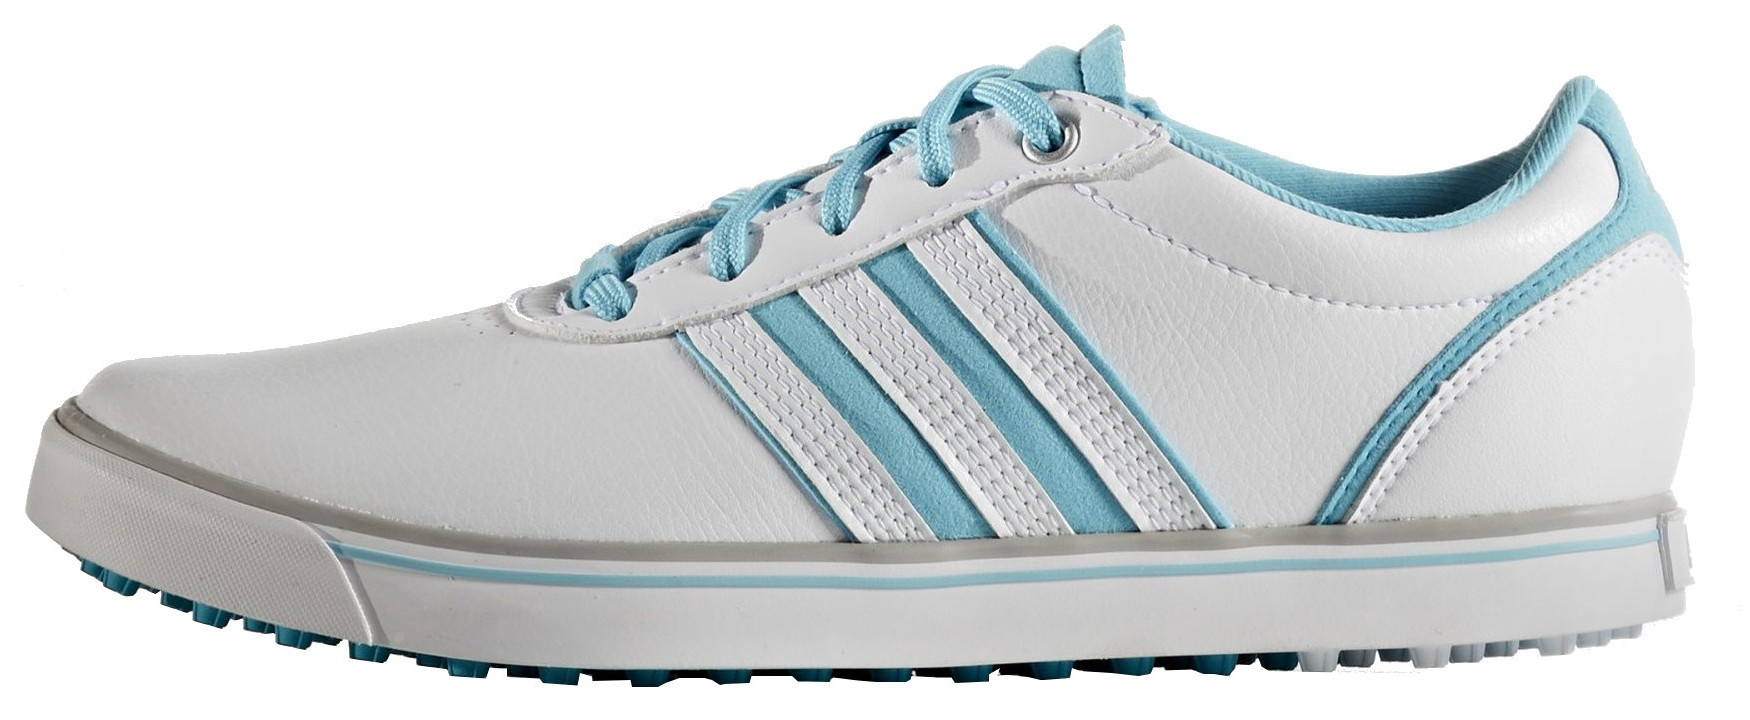 new arrivals 07f59 40e6f adidas golf shoes Adicross V Ladies White  Blue